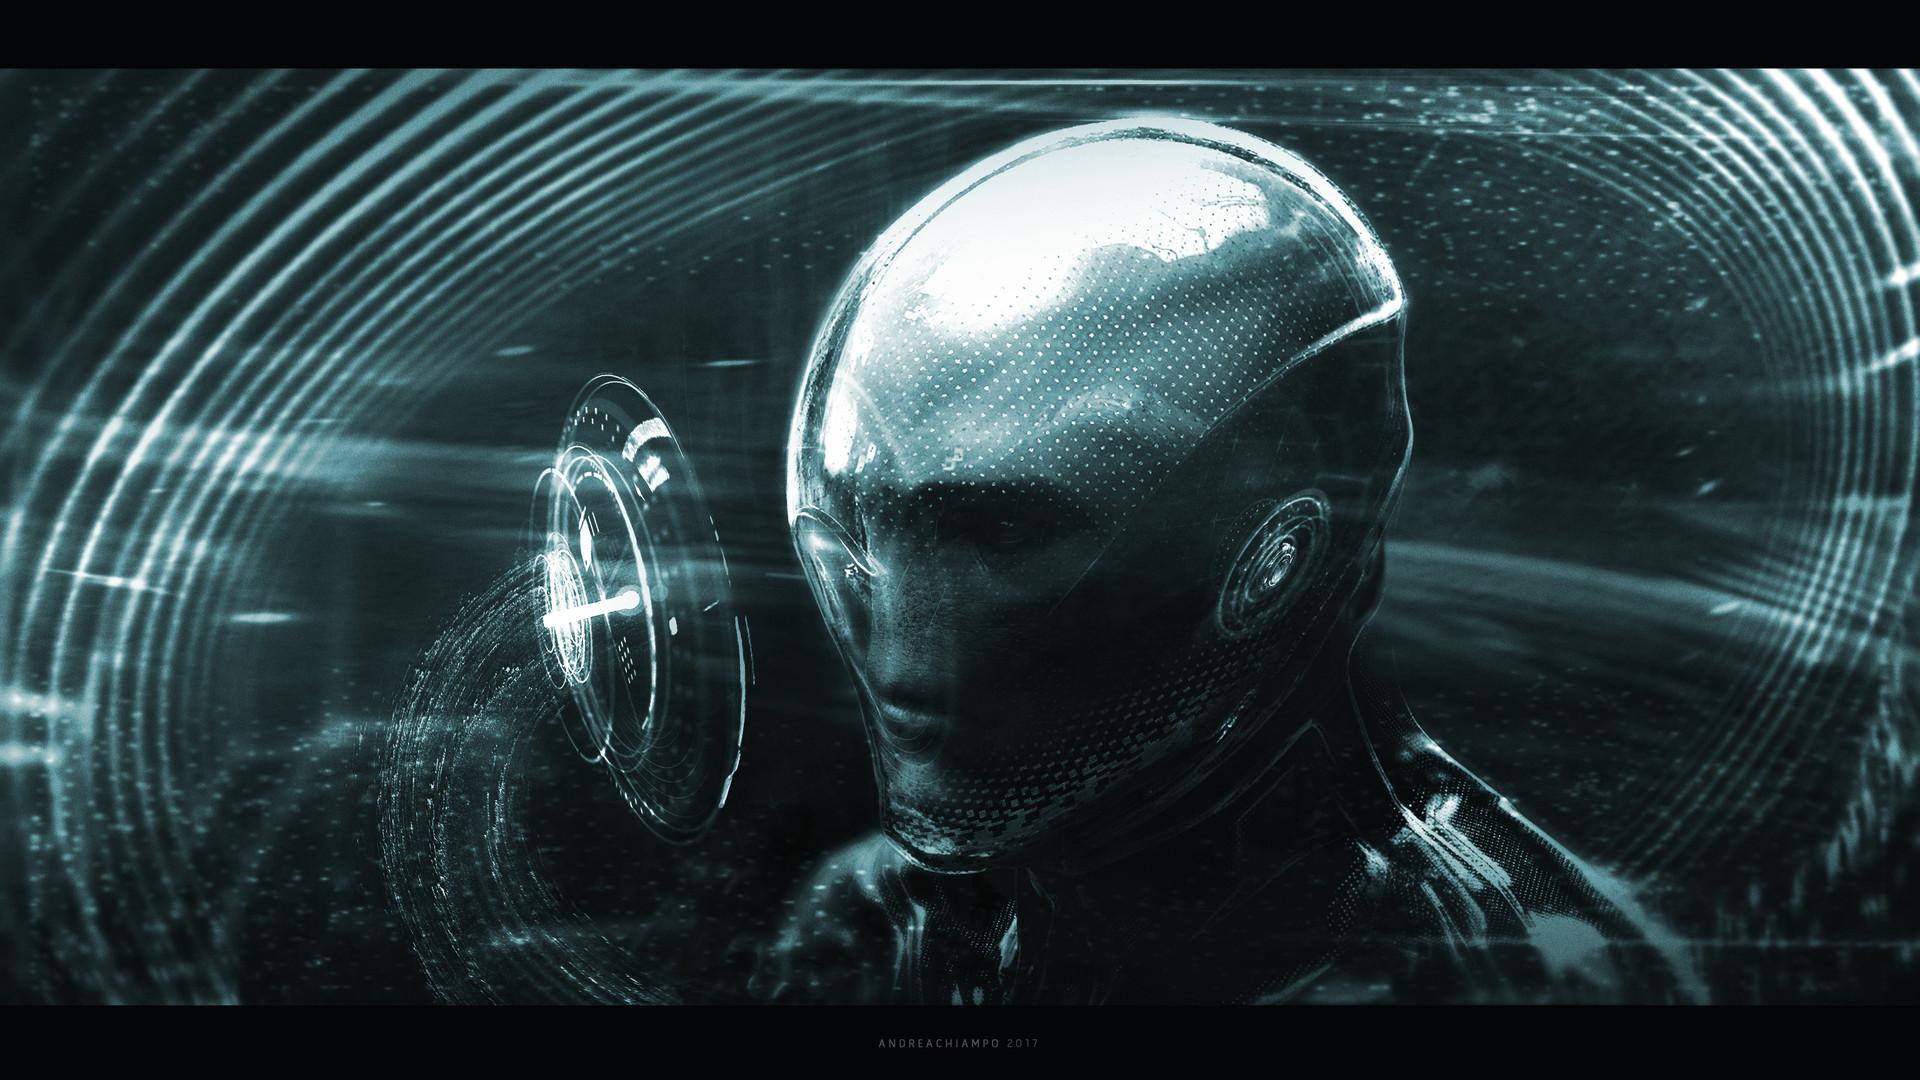 Andrea chiampo alien helmet 12 def sharp noise